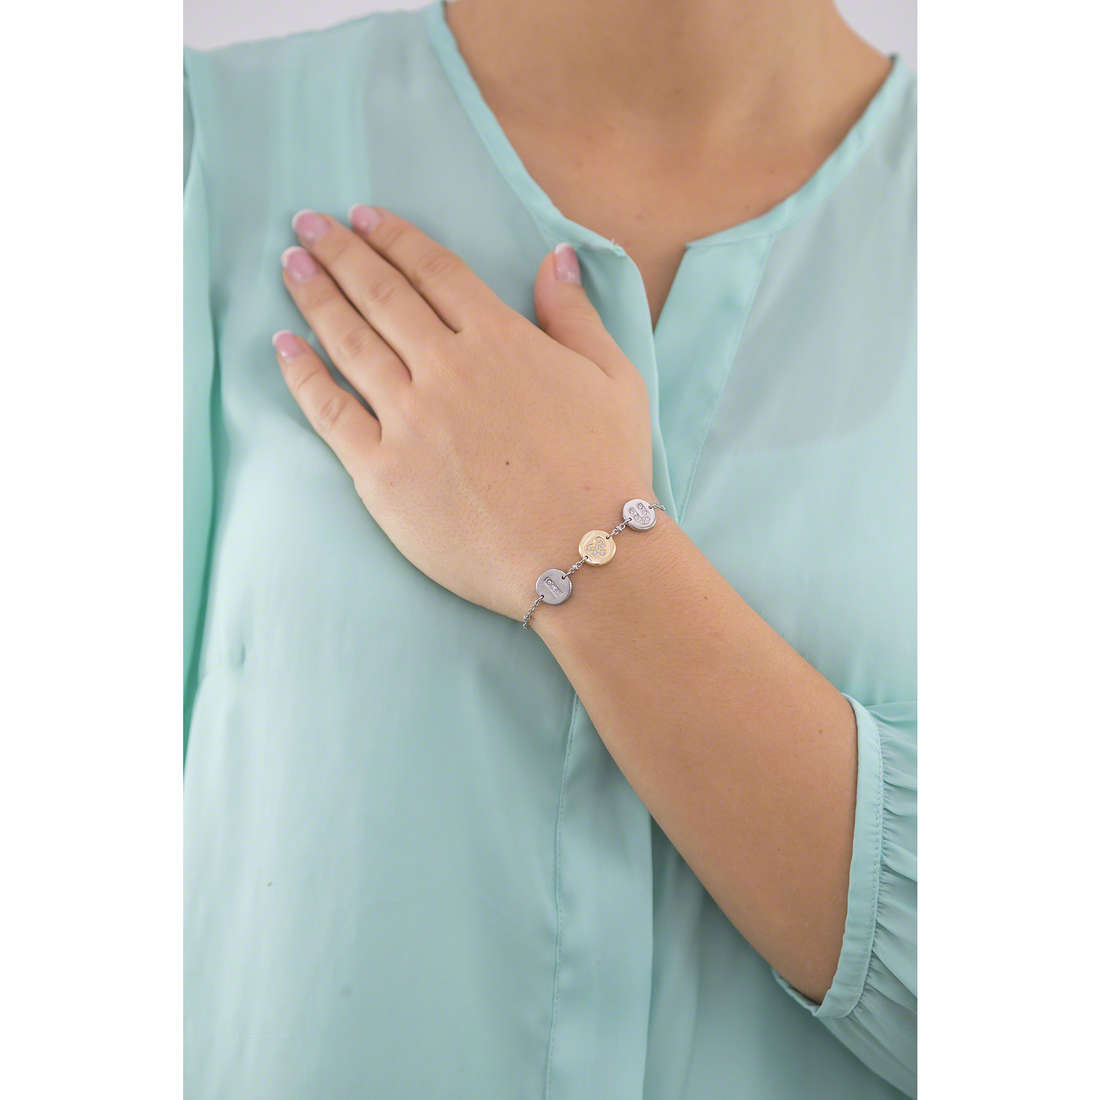 Morellato bracciali Monetine donna SAHQ06 indosso